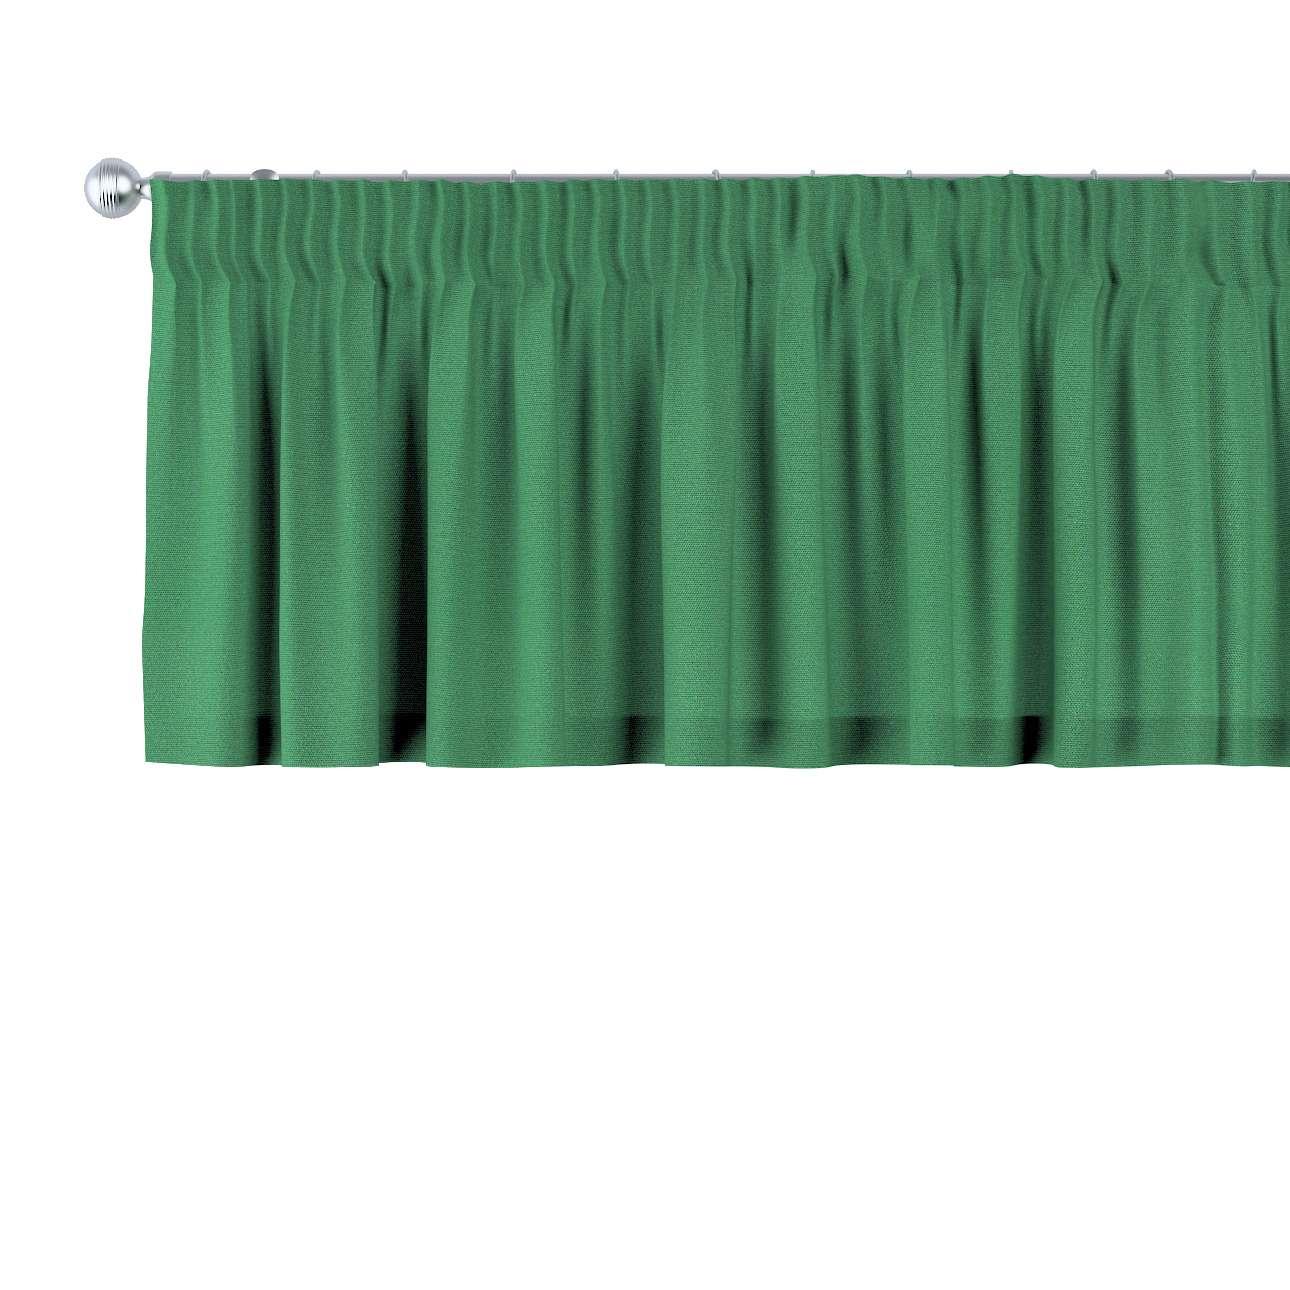 Kurzgardine Mit Kräuselband : kurzgardine mit kr uselband gr n 133 18 dekoria ~ A.2002-acura-tl-radio.info Haus und Dekorationen